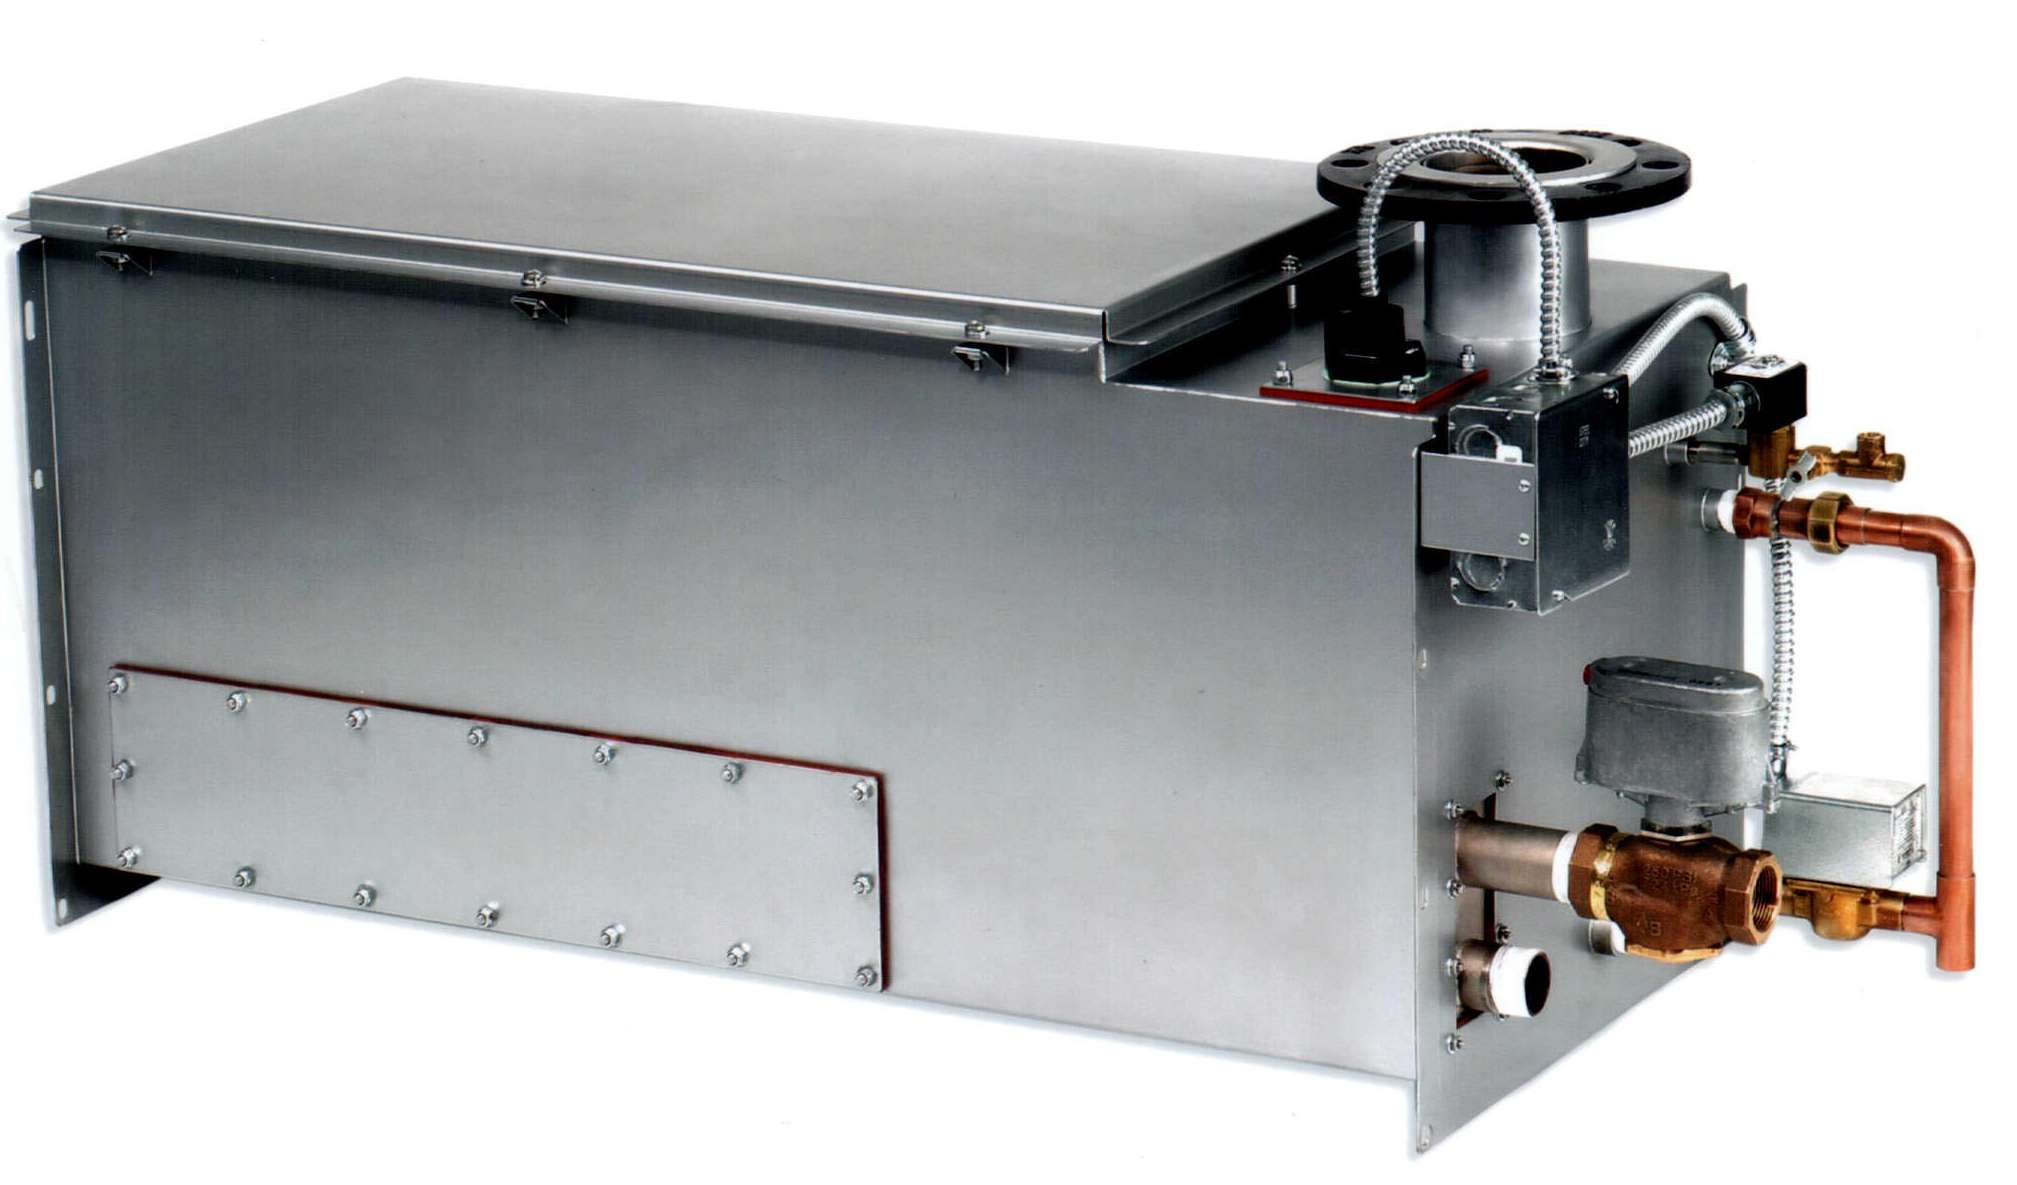 humidifier offers improved maintenance access dri steem humidifier co  #6E3823